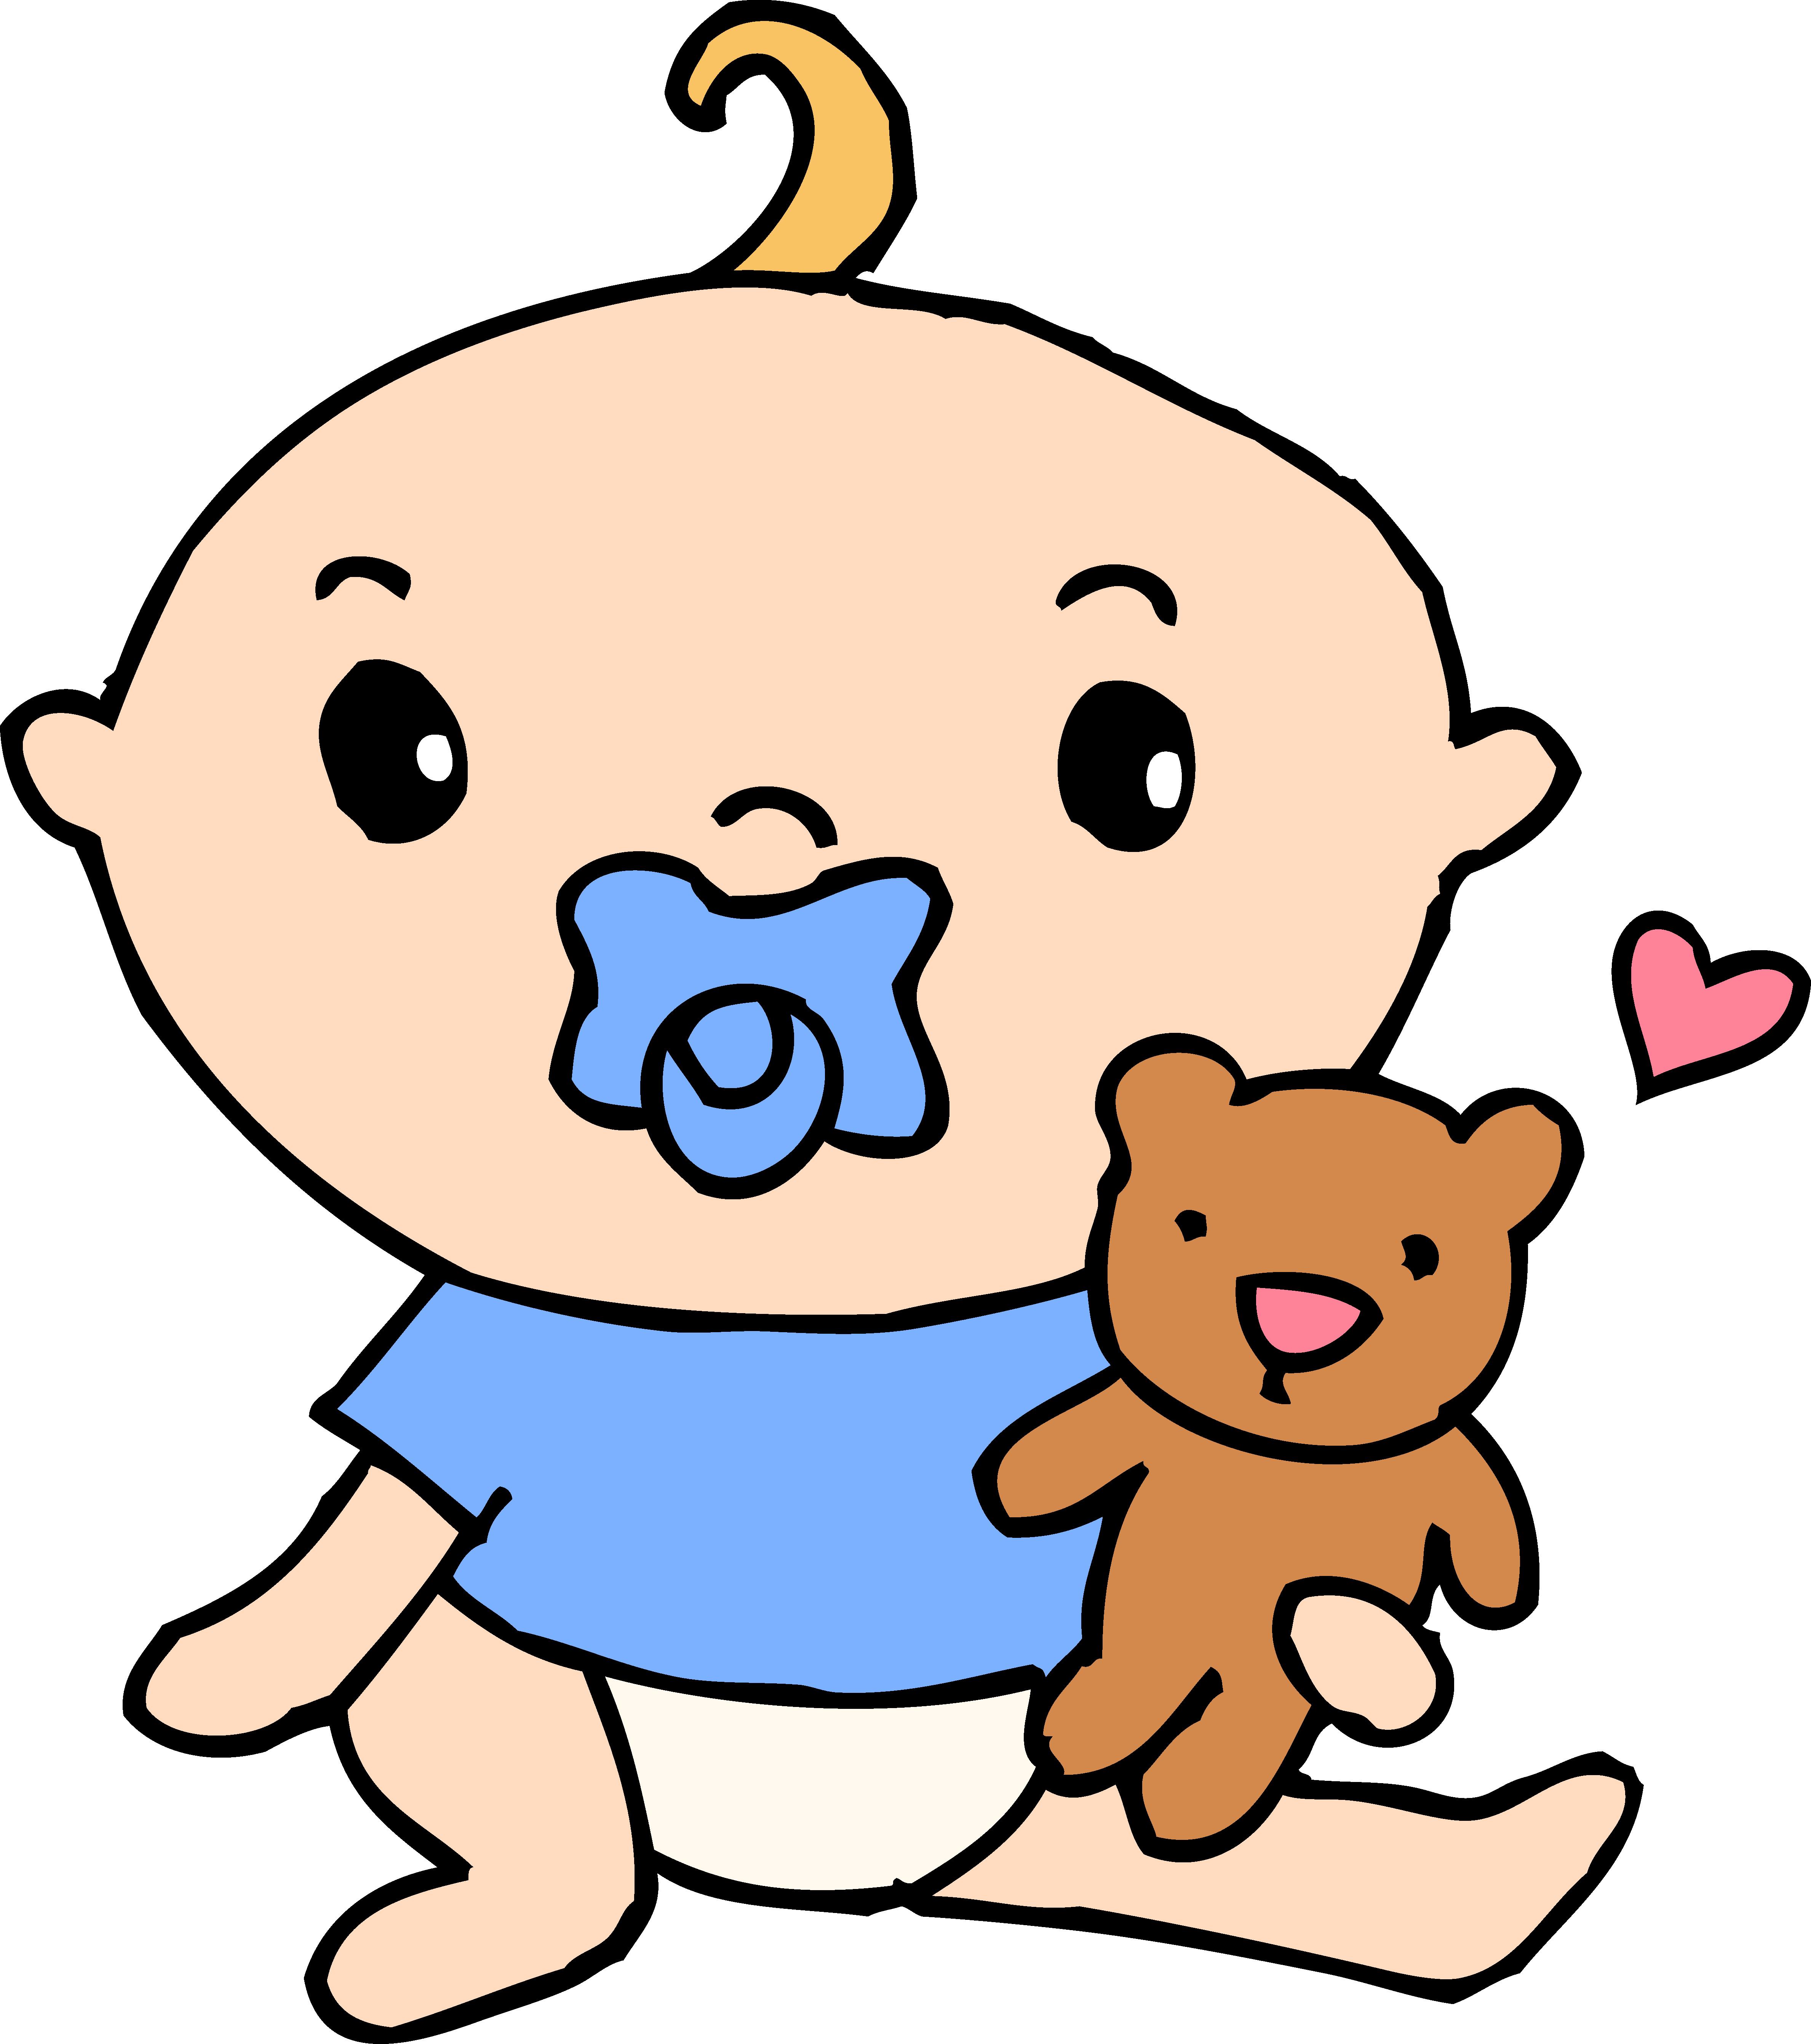 4755x5367 Baby Boy Clip Art Baby Clipart Image 2 4